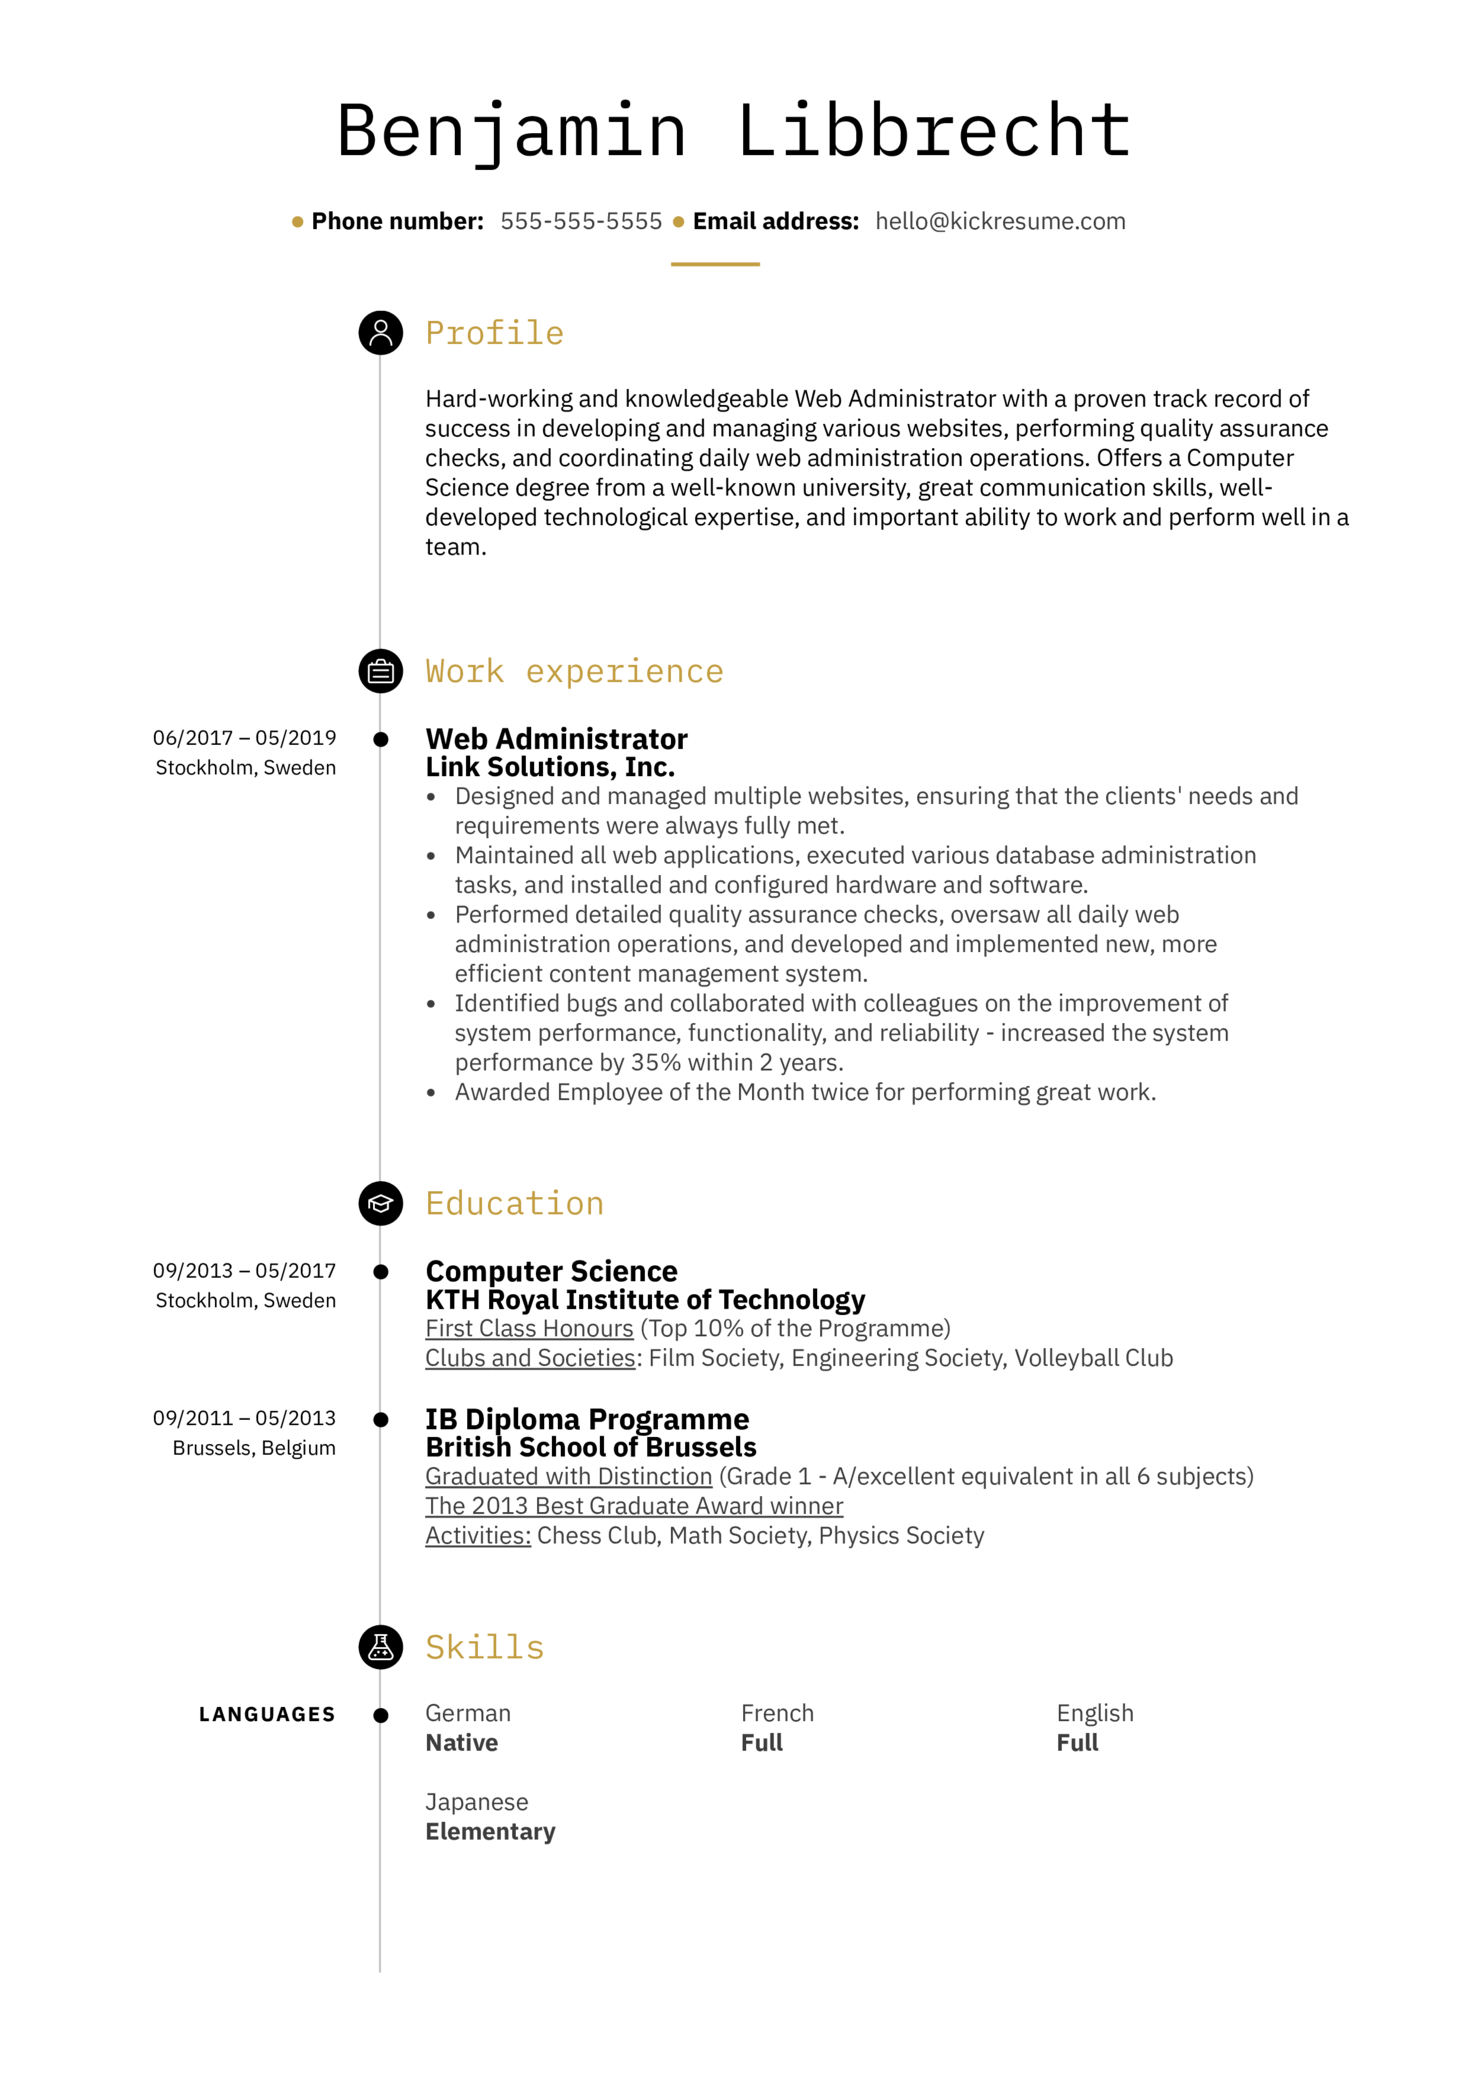 Web Administrator Resume Sample (parte 1)